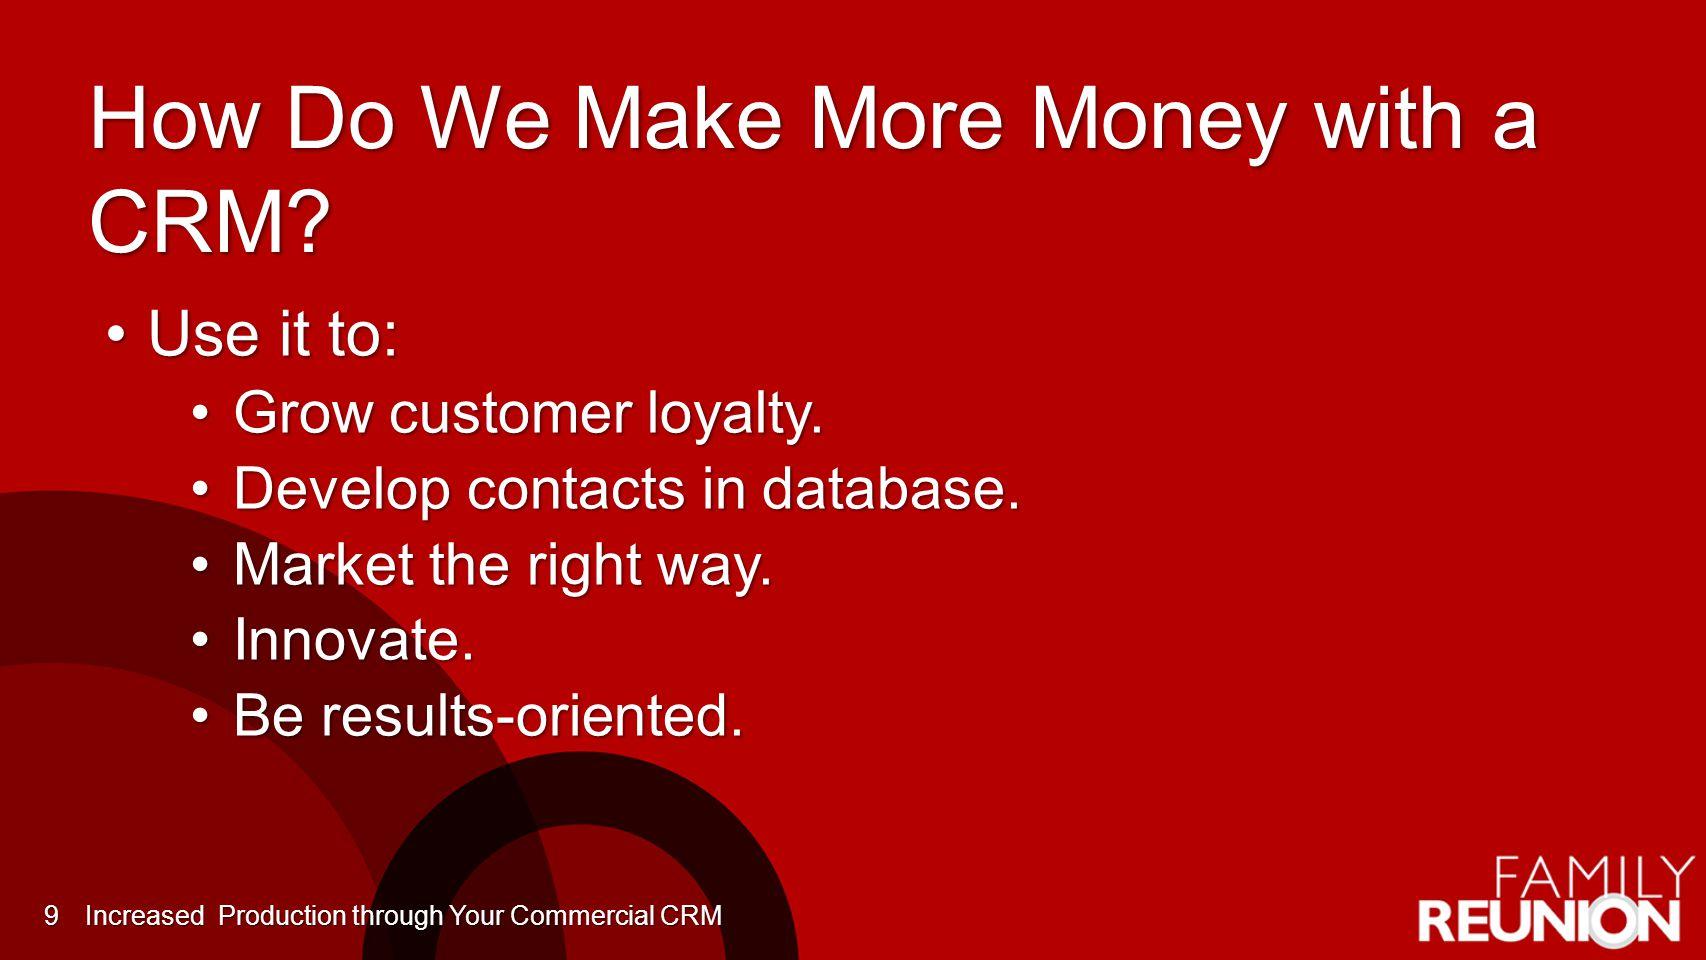 How Do We Make More Money with a CRM.